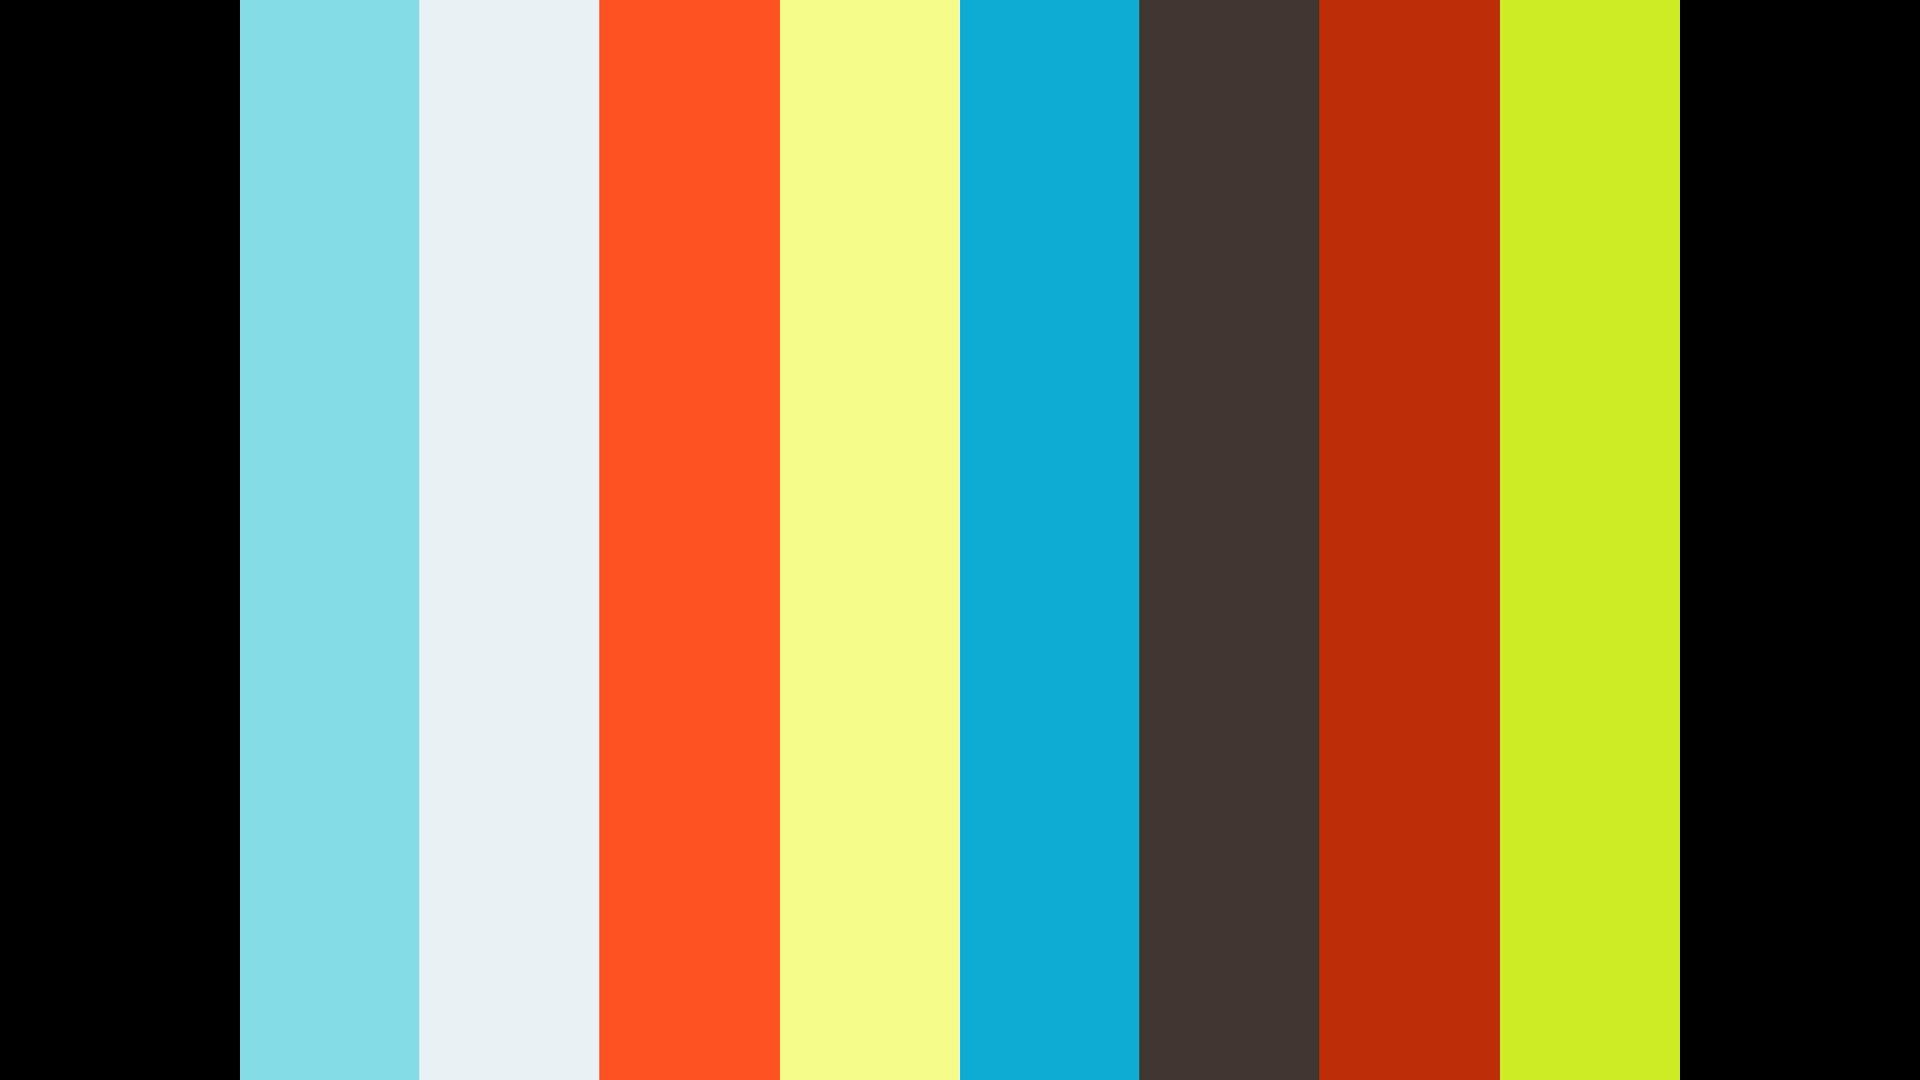 KHNA2019-FriPublicMeeting